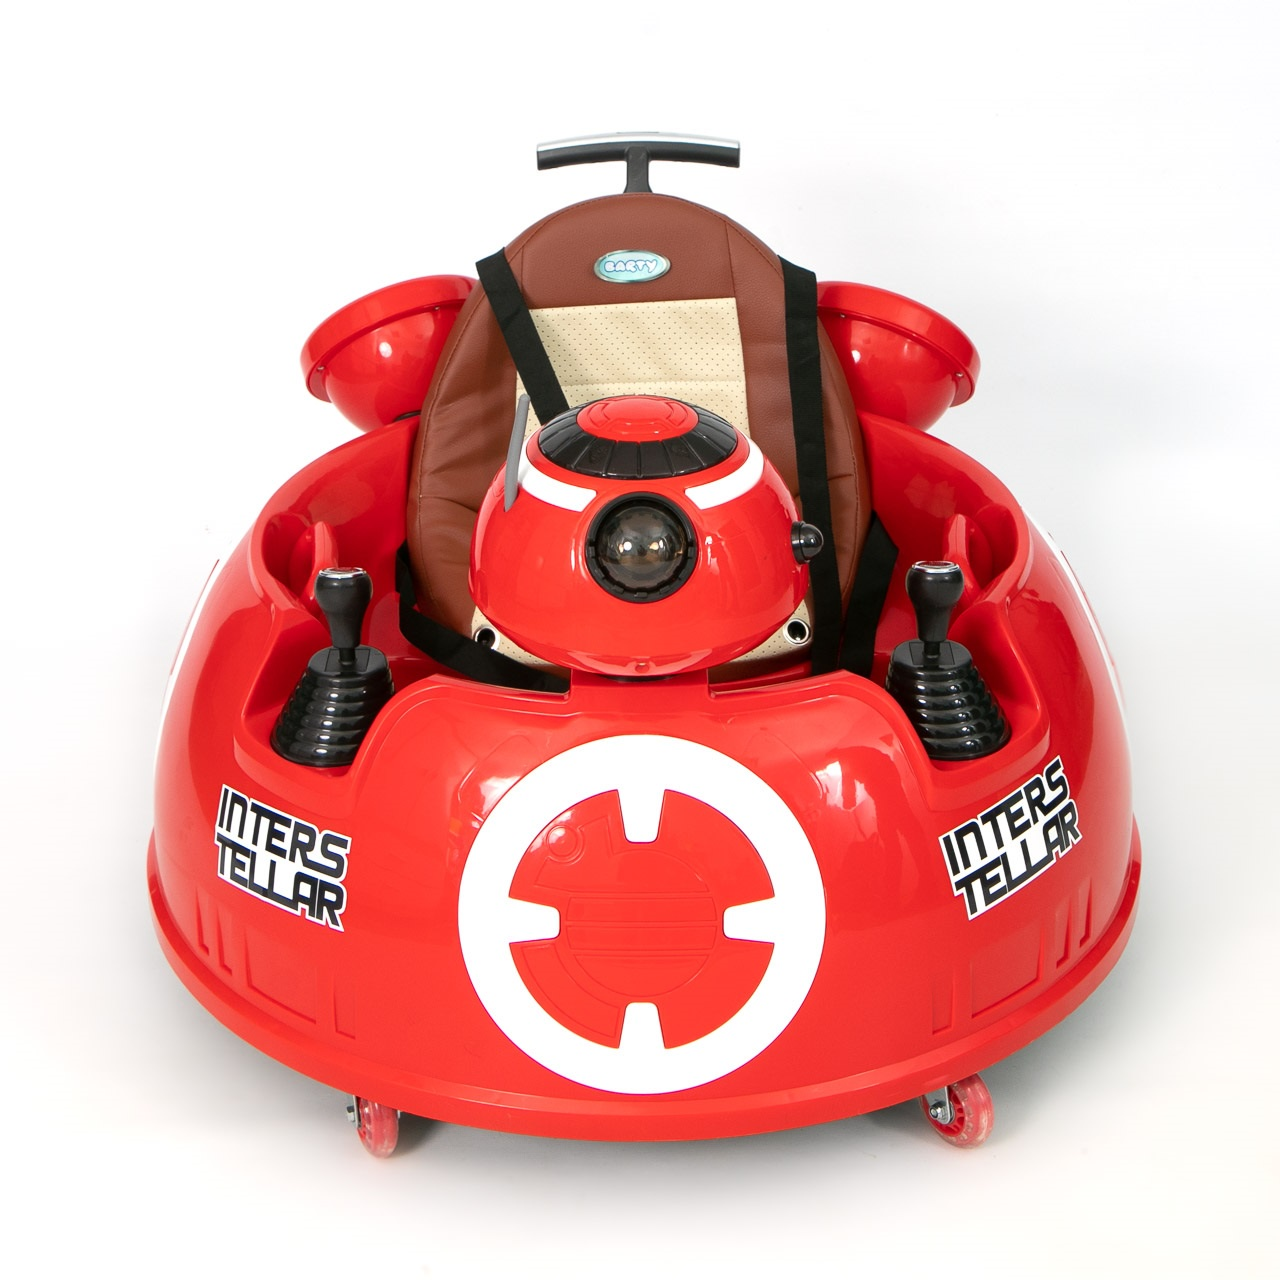 Электромобиль Barty ANDROID COSMIC, красный толокар barty bl7602 красный